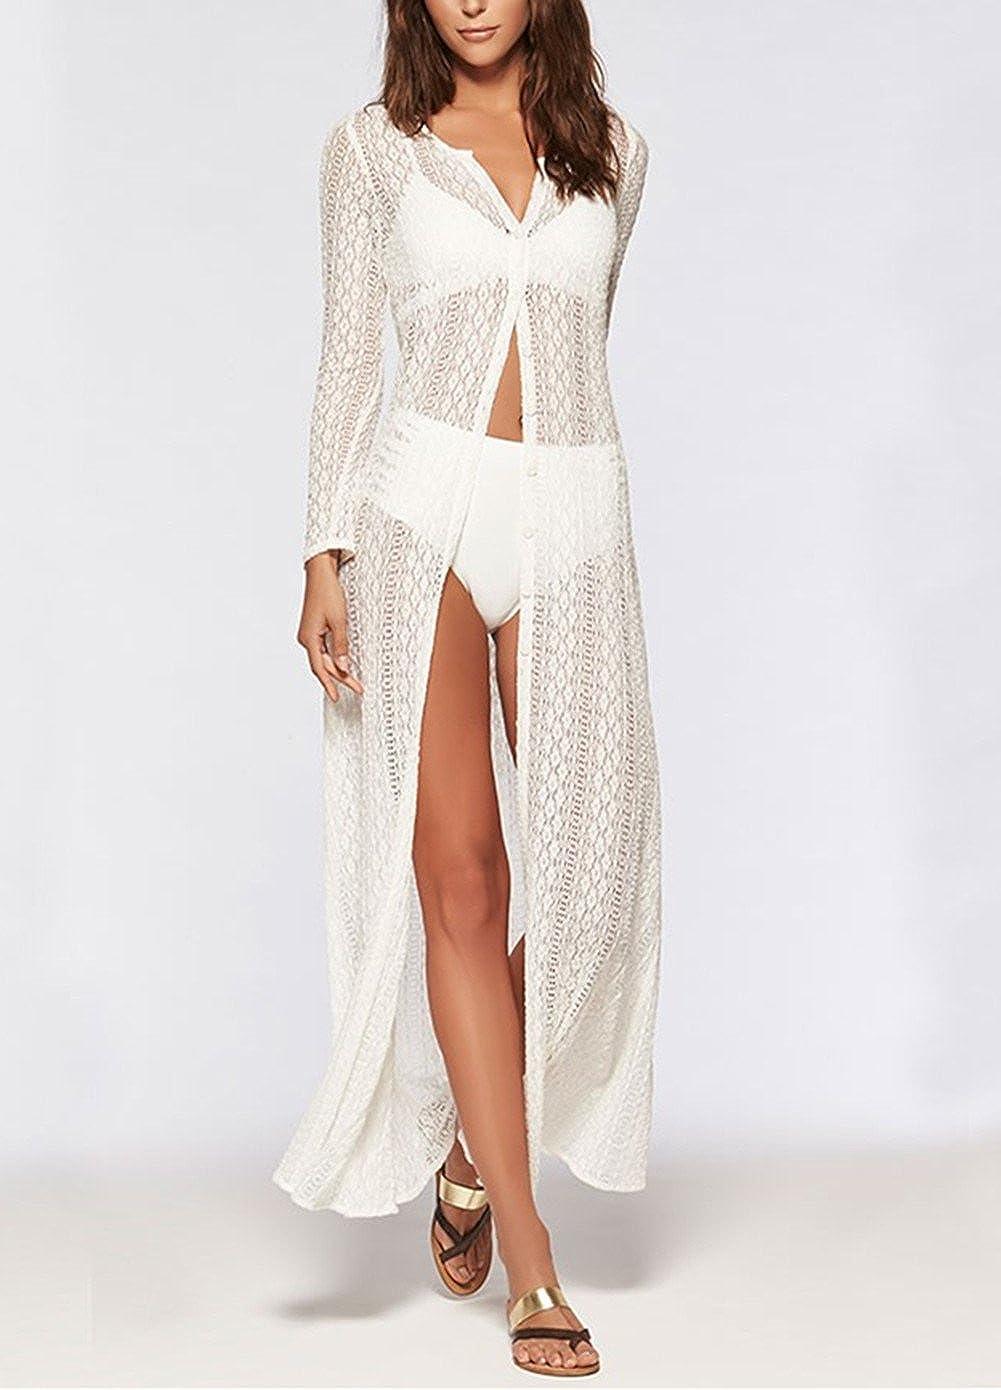 L-Peach Damen Spitze Blumen Lange Kaftan Sommerkleid Strandkleid Bikini Coverups Beachwear One Size